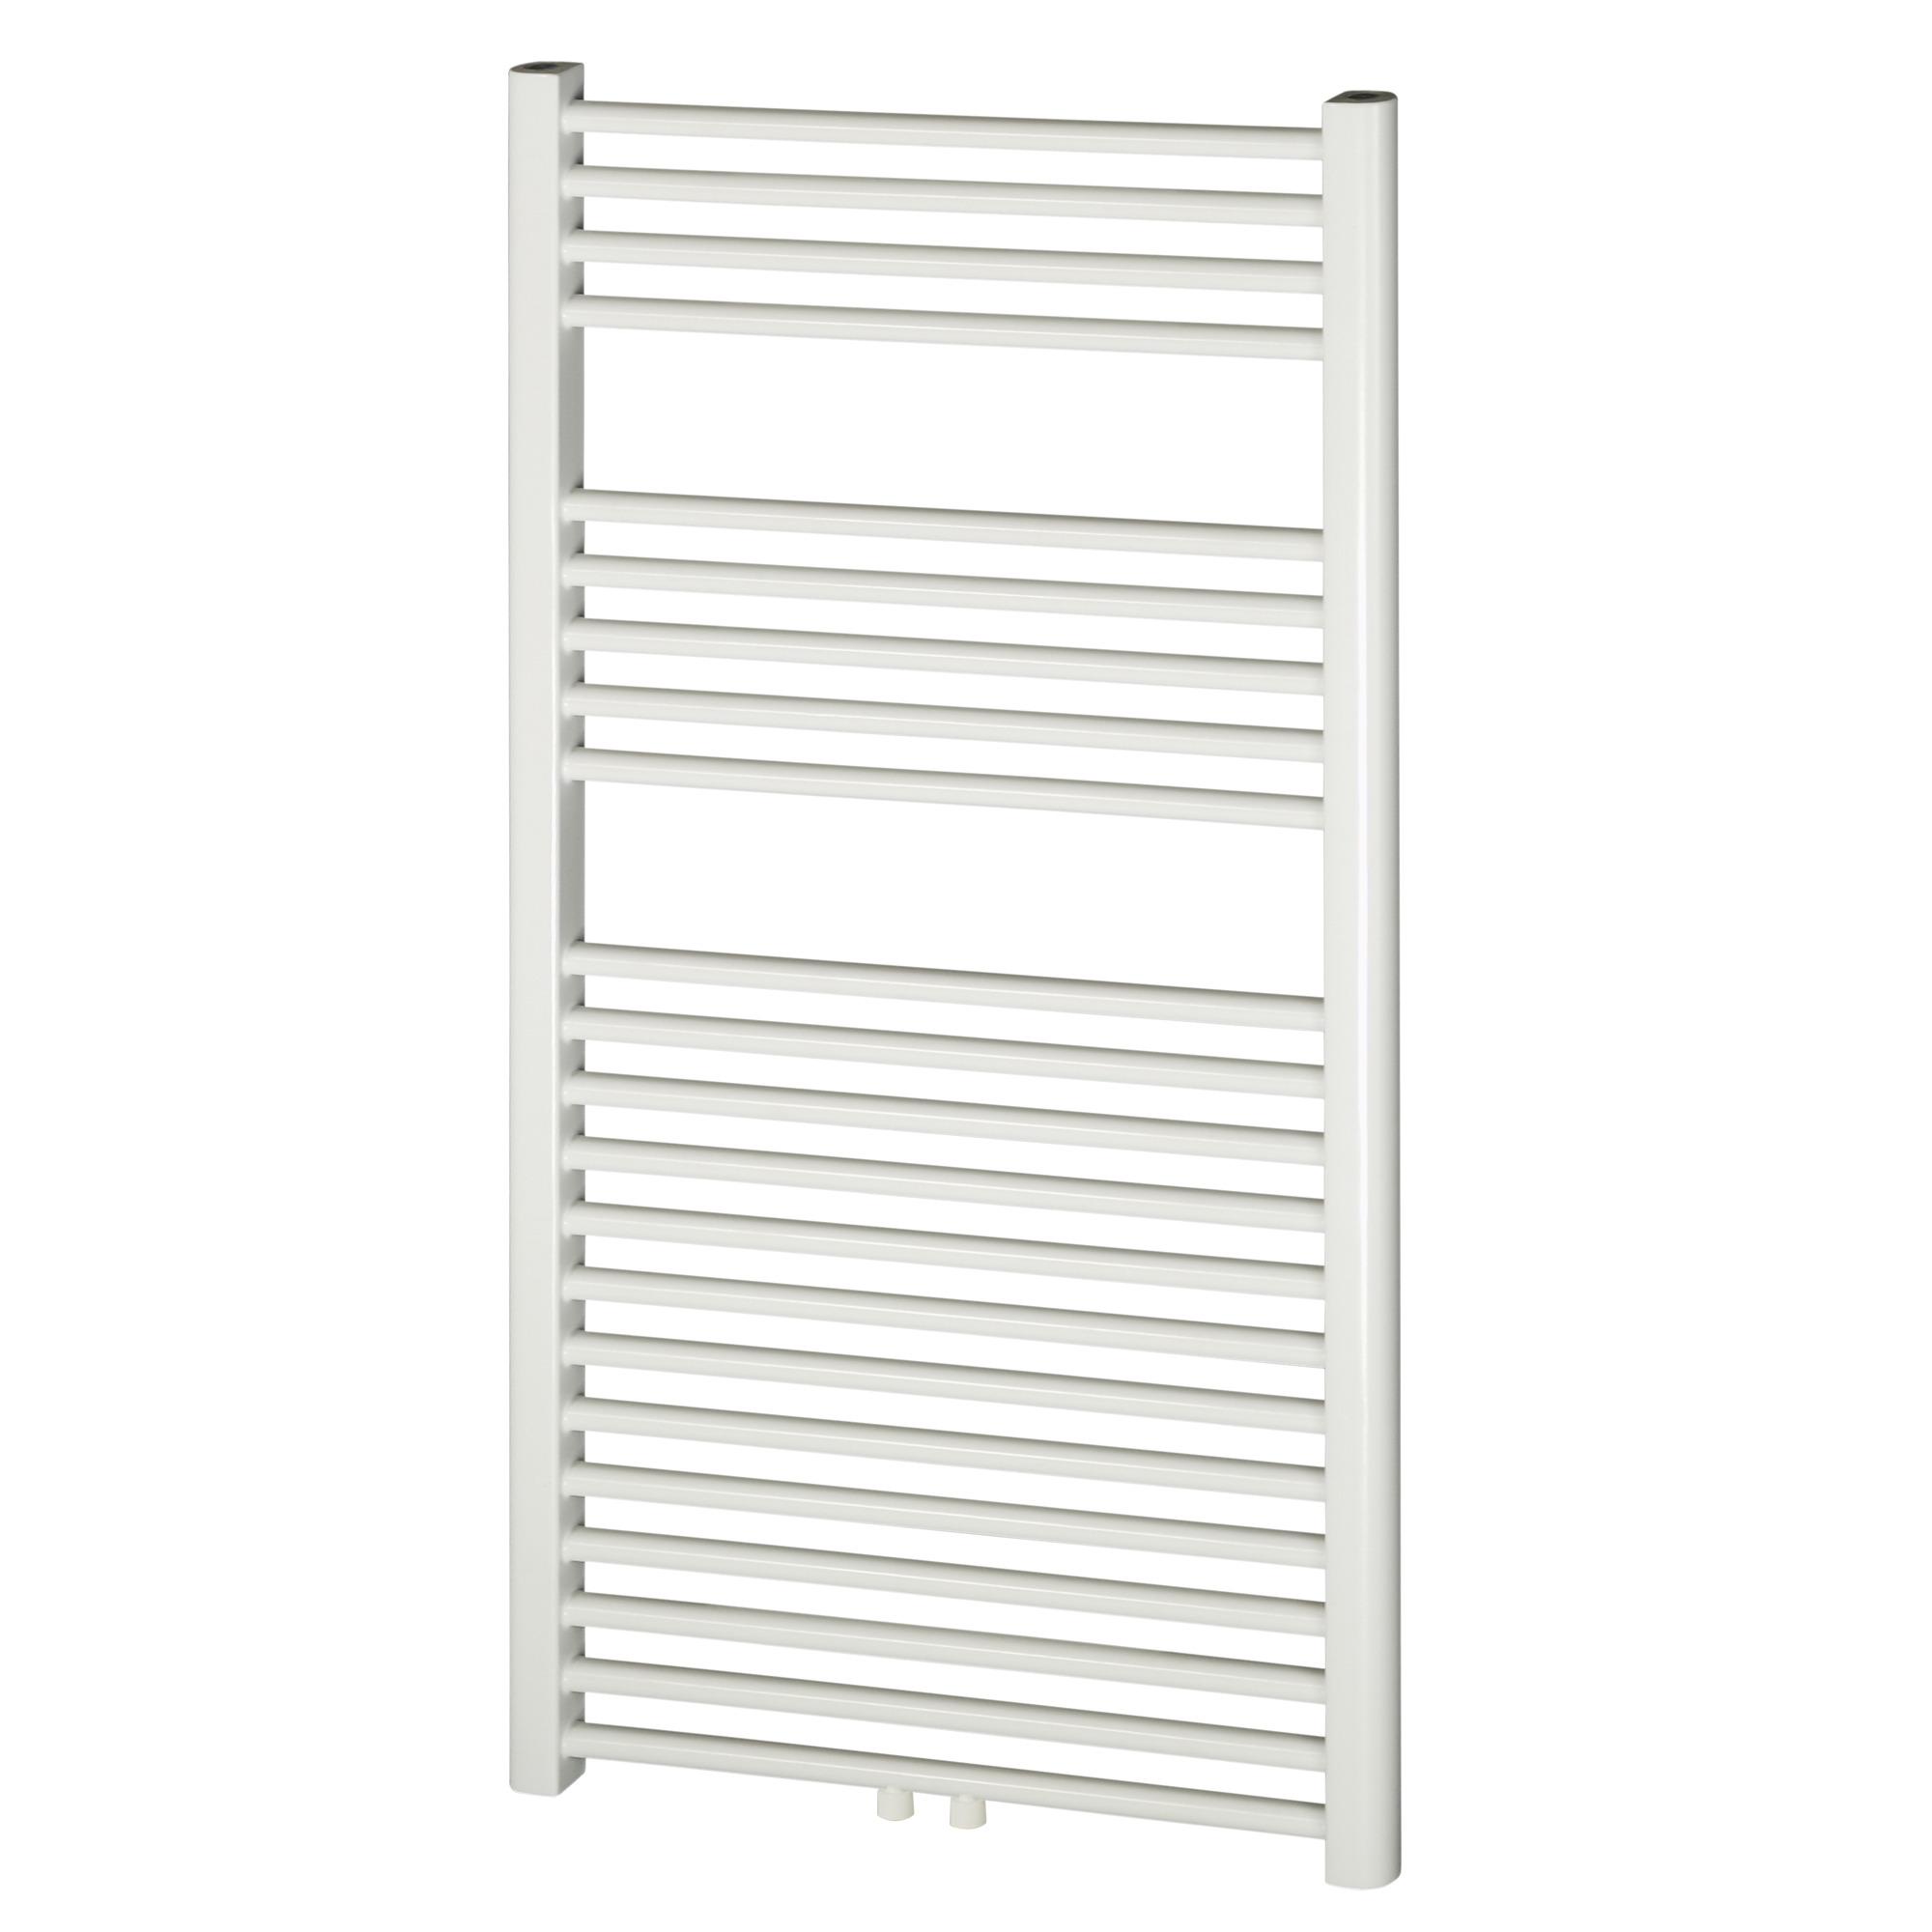 Haceka Gobi Design radiator 6 punts 111x59cm 565 watt wit